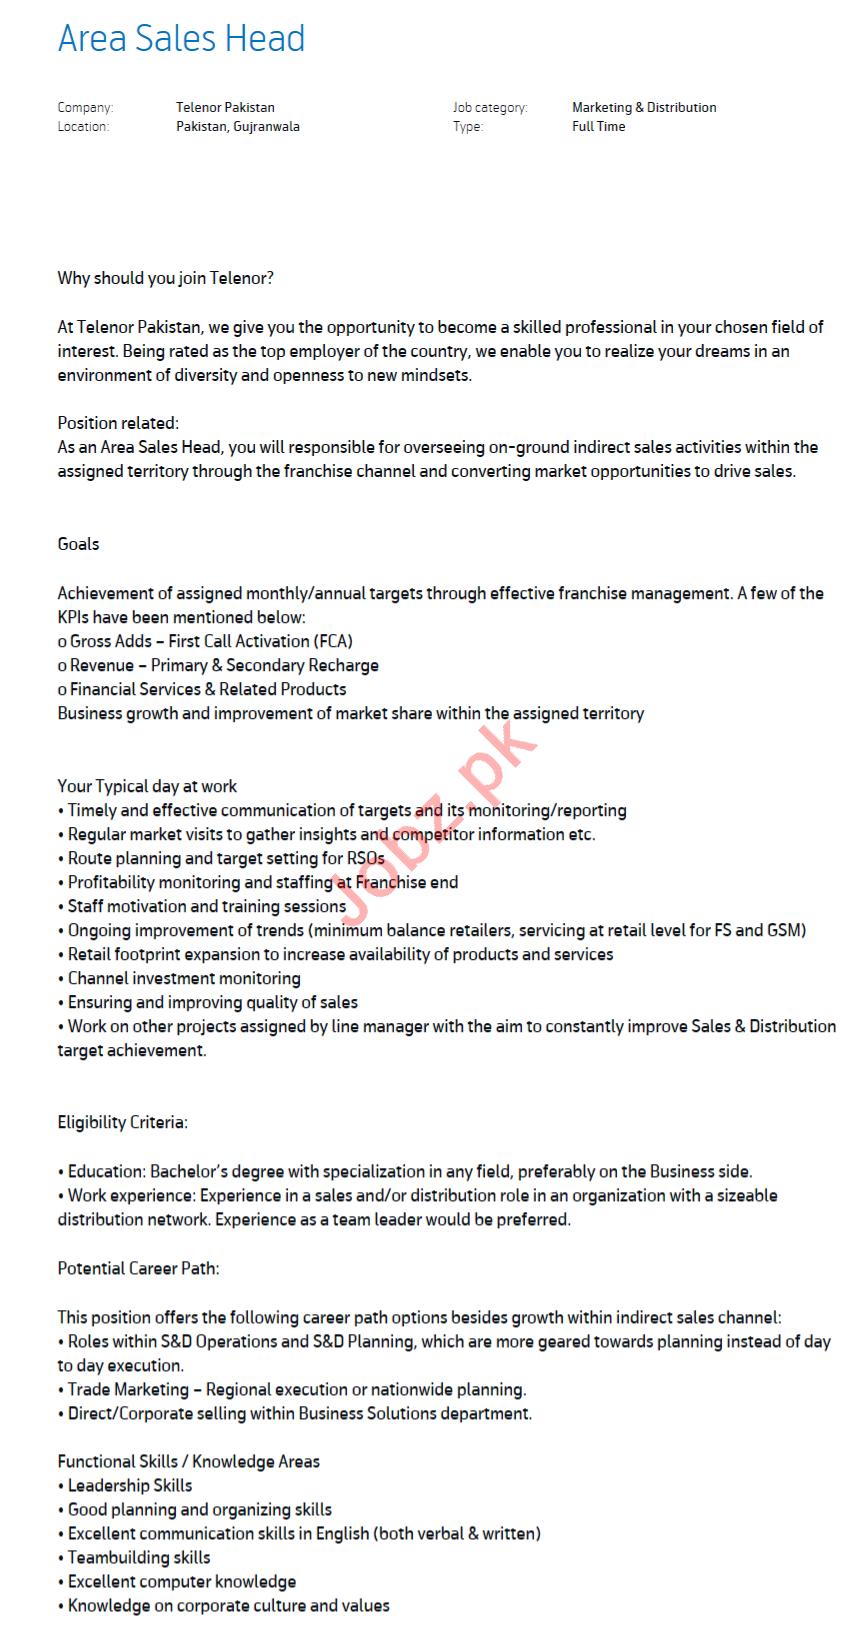 Area Sales Head Jobs 2020 in Telenor Pakistan